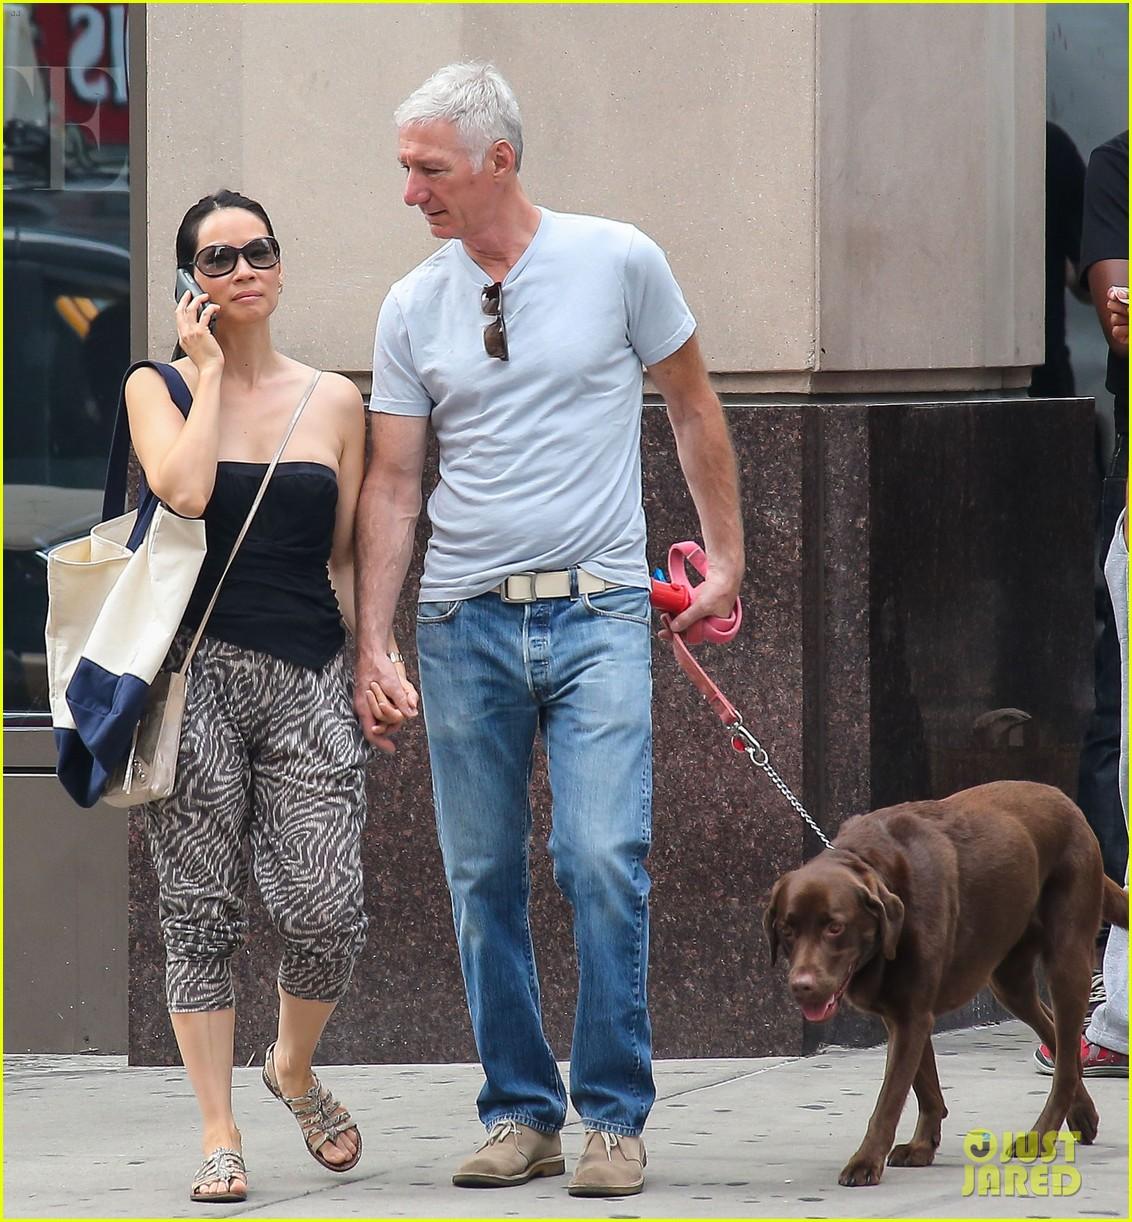 lucy liu new boyfriend hold hands in new york city 062932376